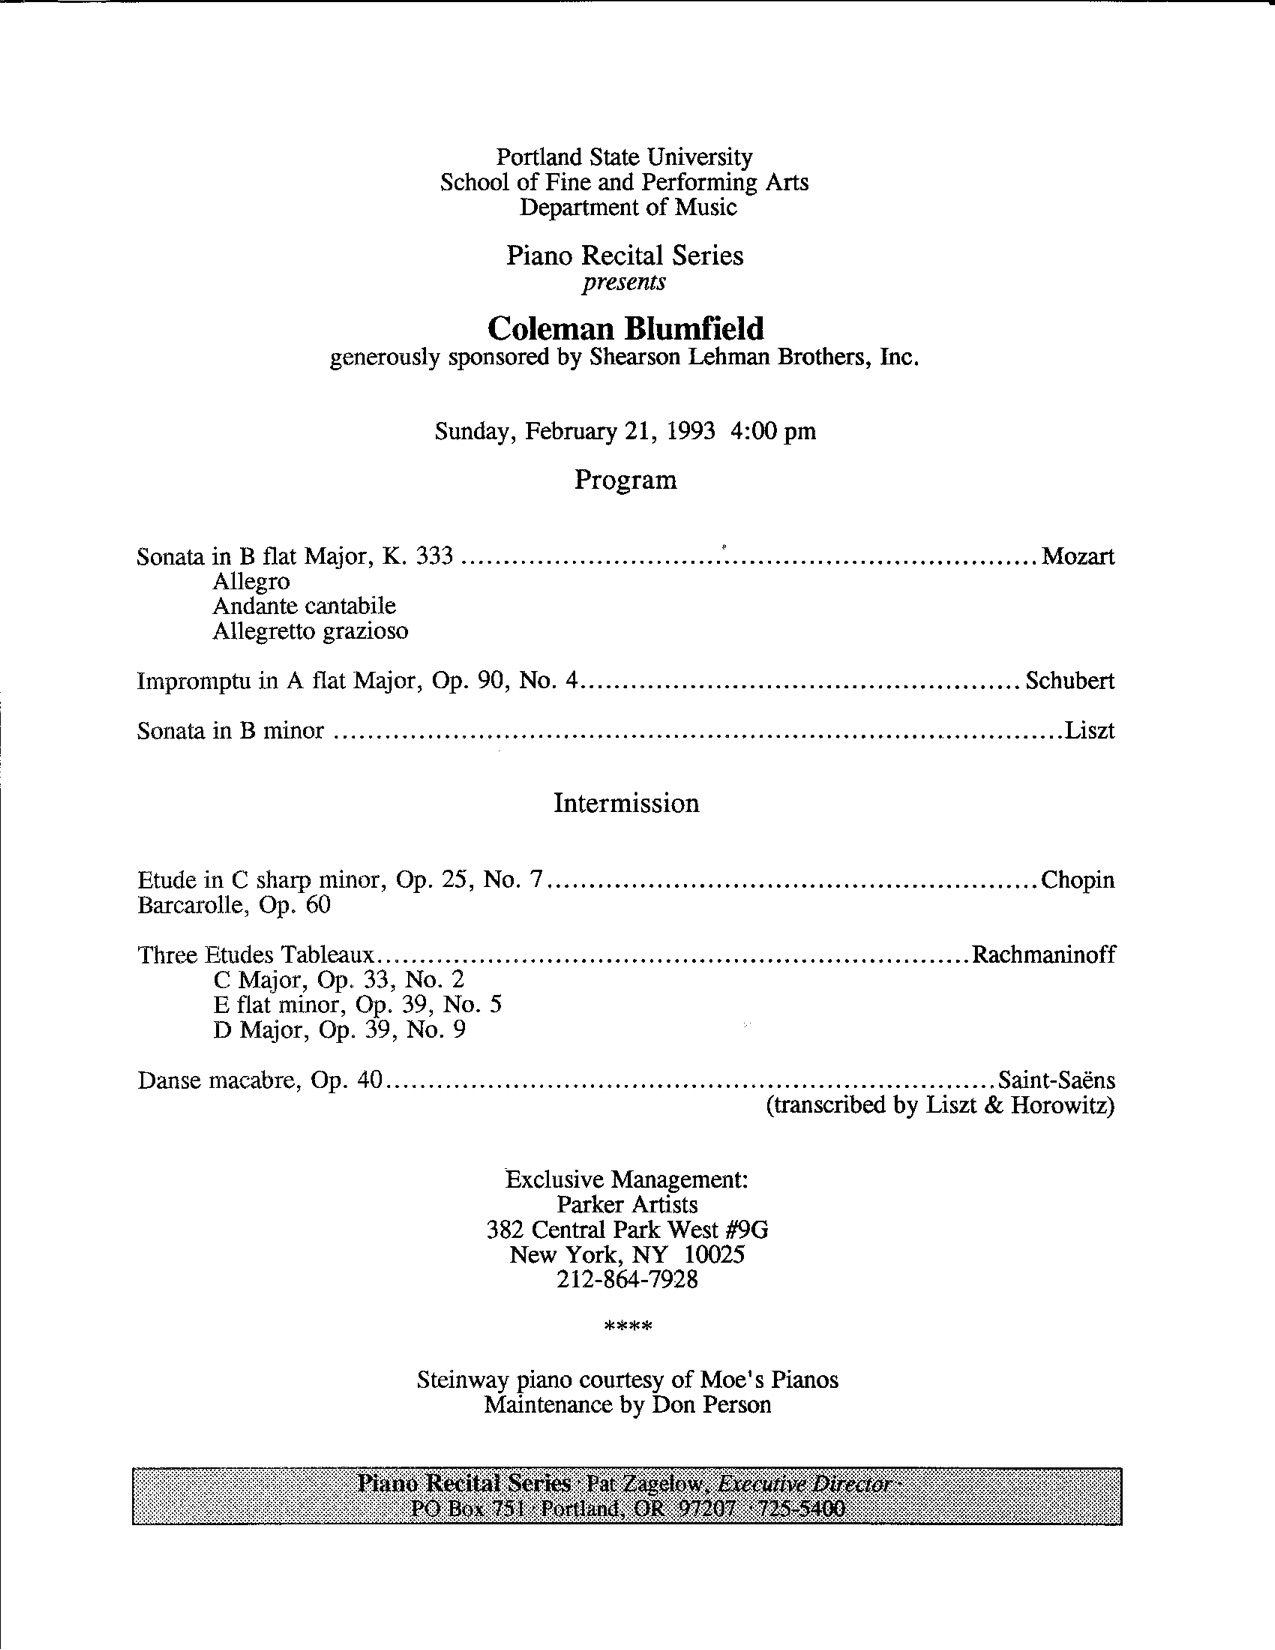 Blumfield92-93_Program2.jpg